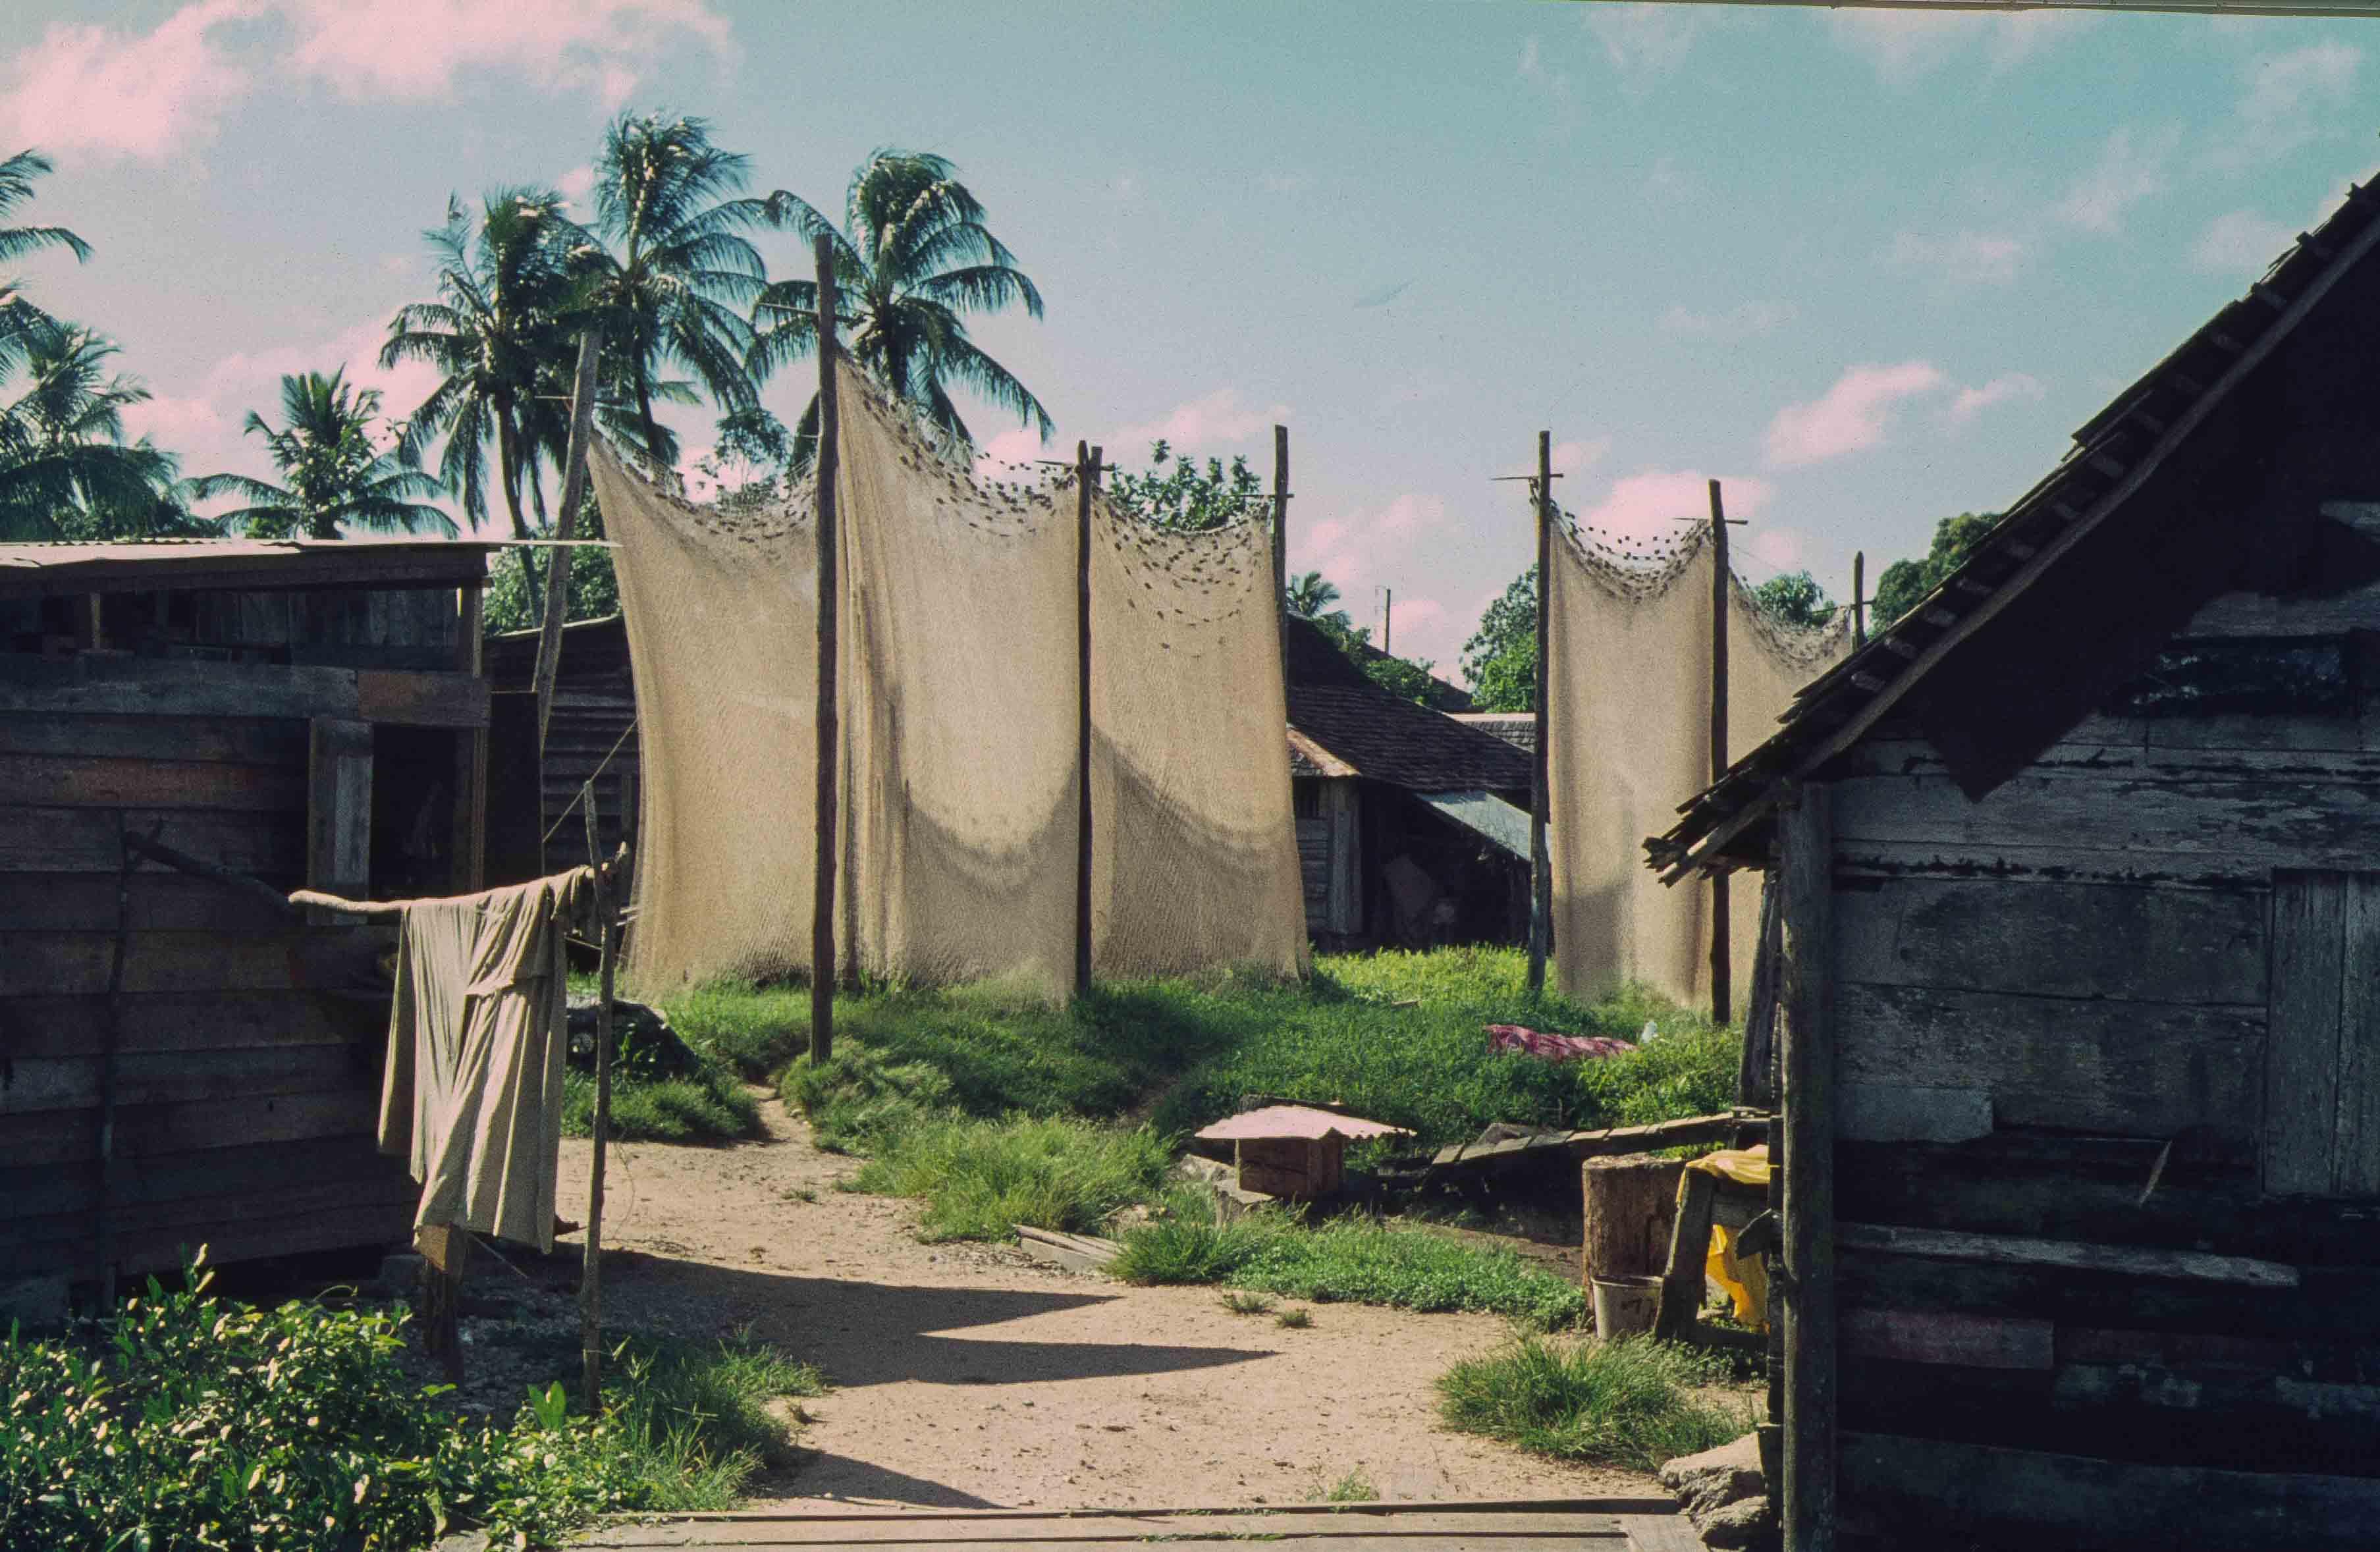 451. Suriname